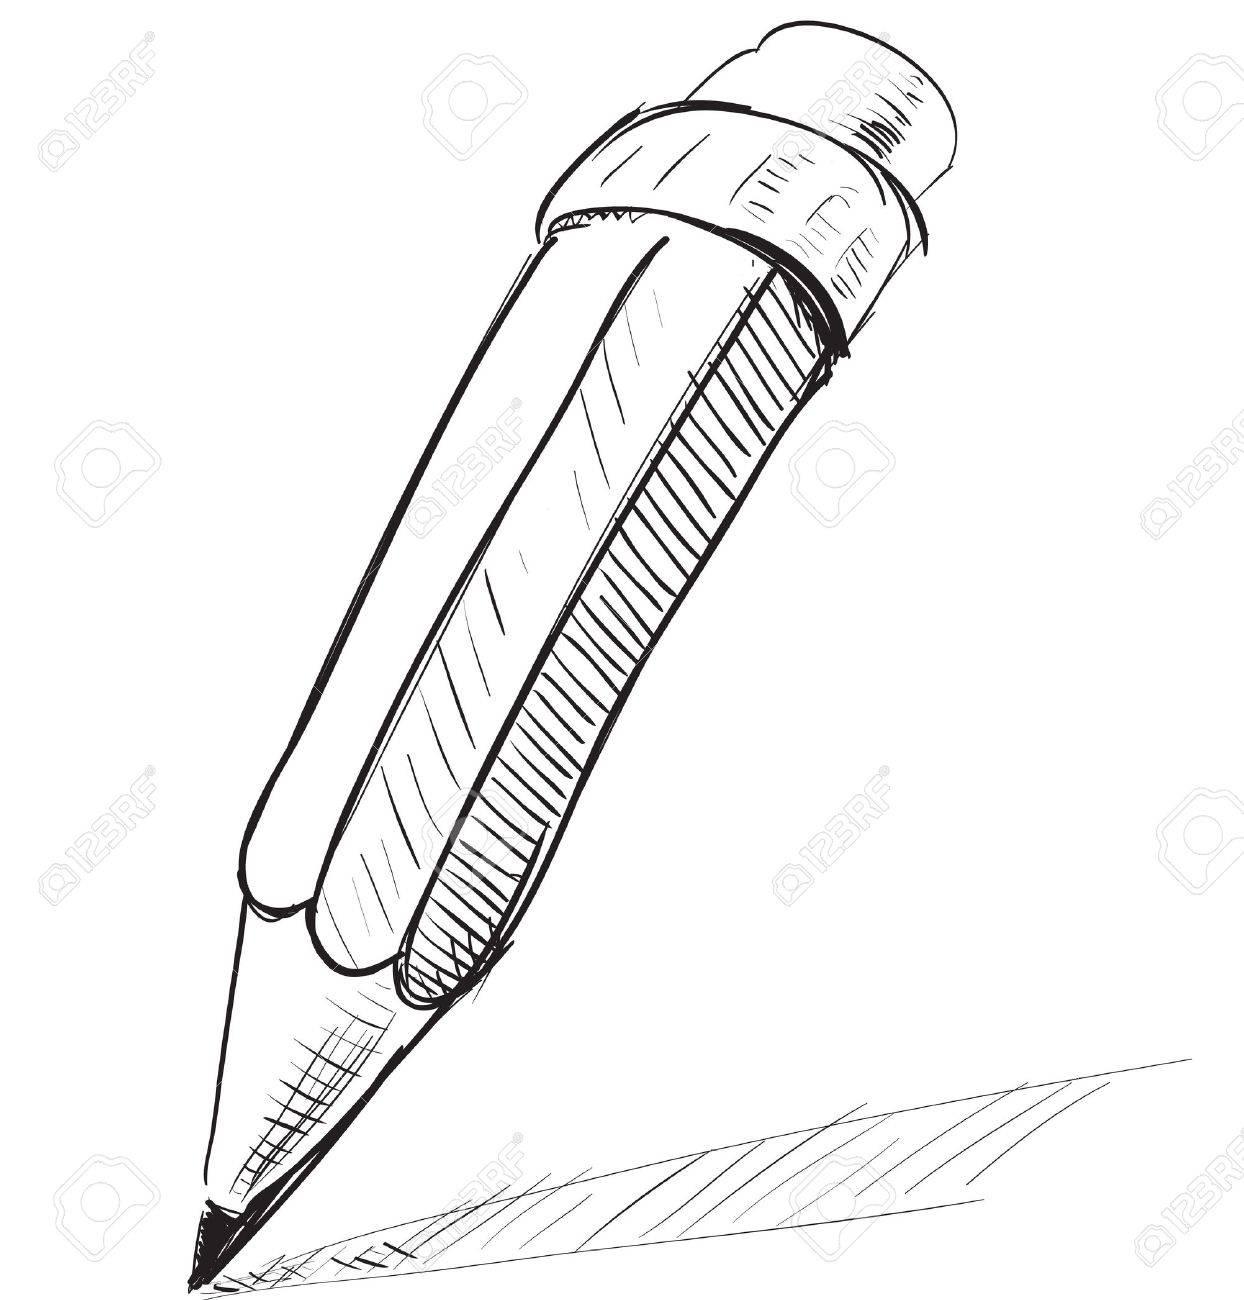 Pencil sketch cartoon illustration stock vector 18447340